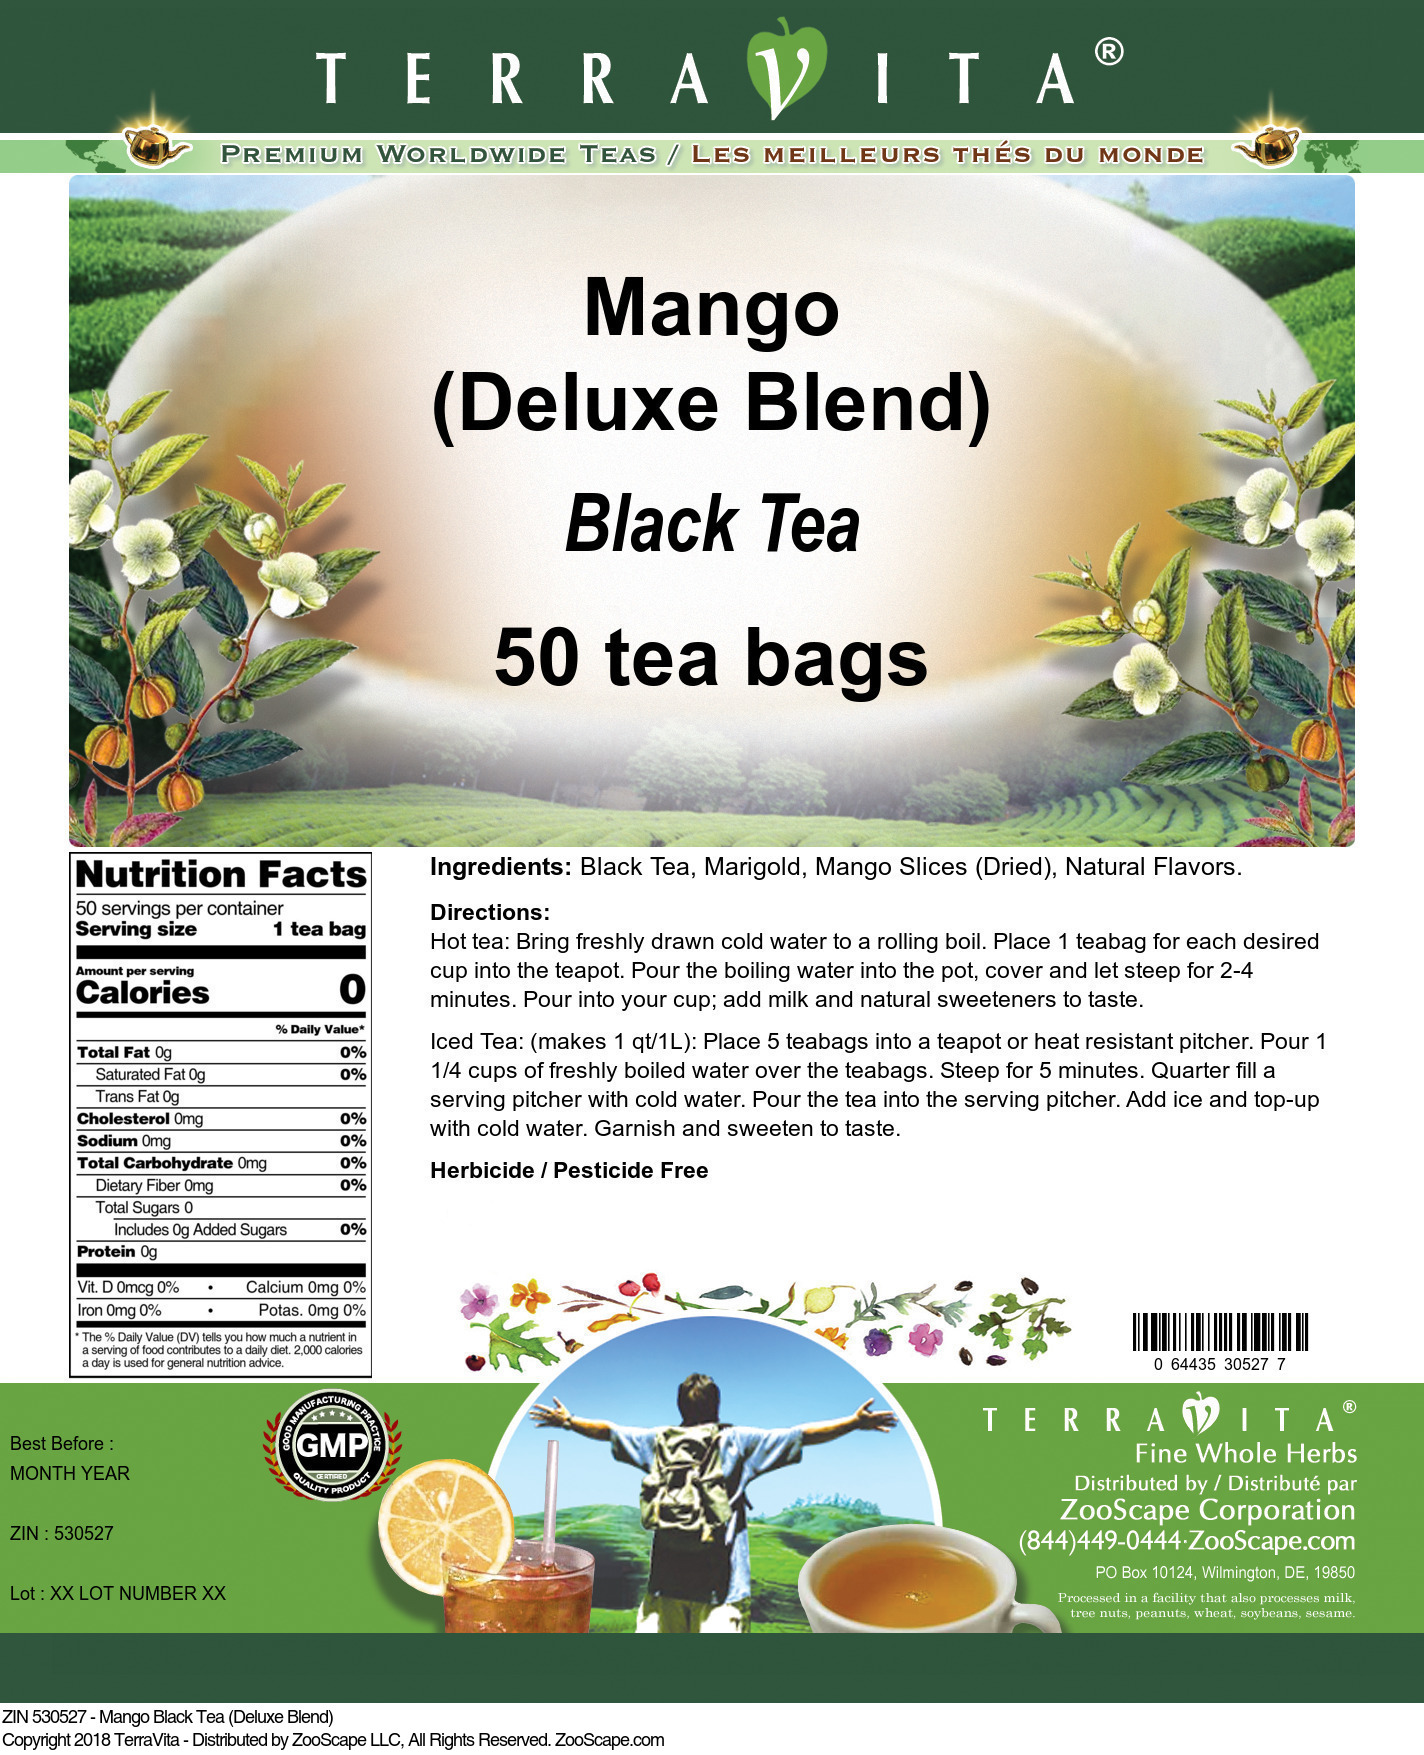 Mango Black Tea (Deluxe Blend)